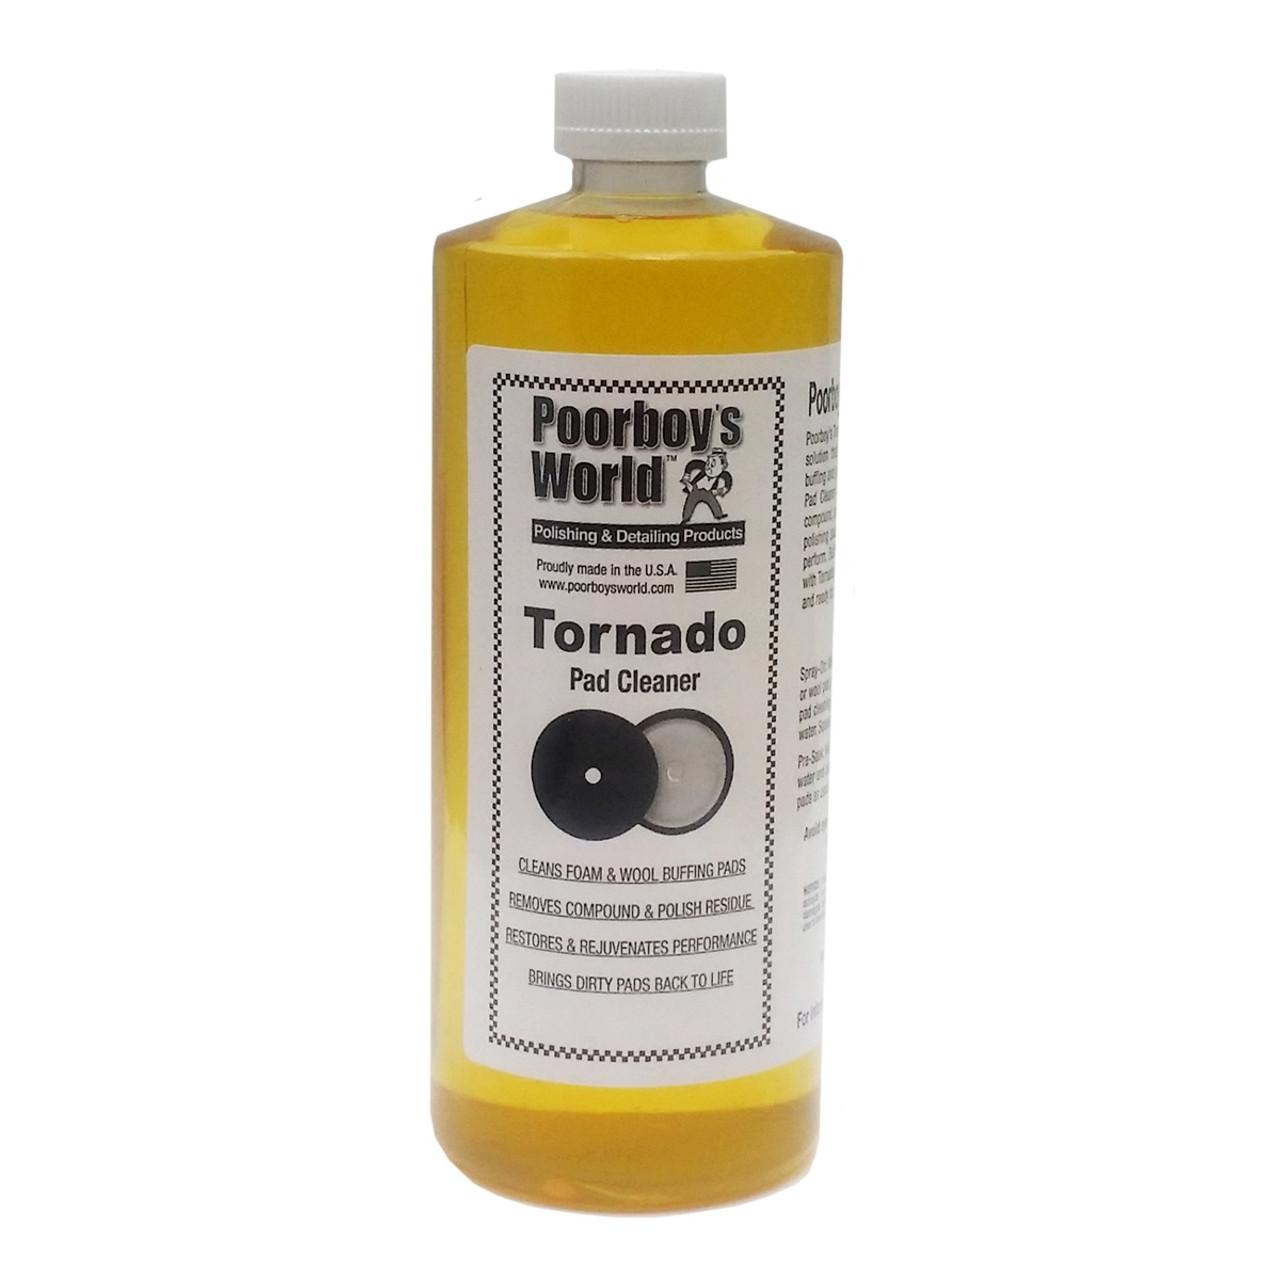 Poorboy's World Tornado Pad Cleaner 32oz Refill